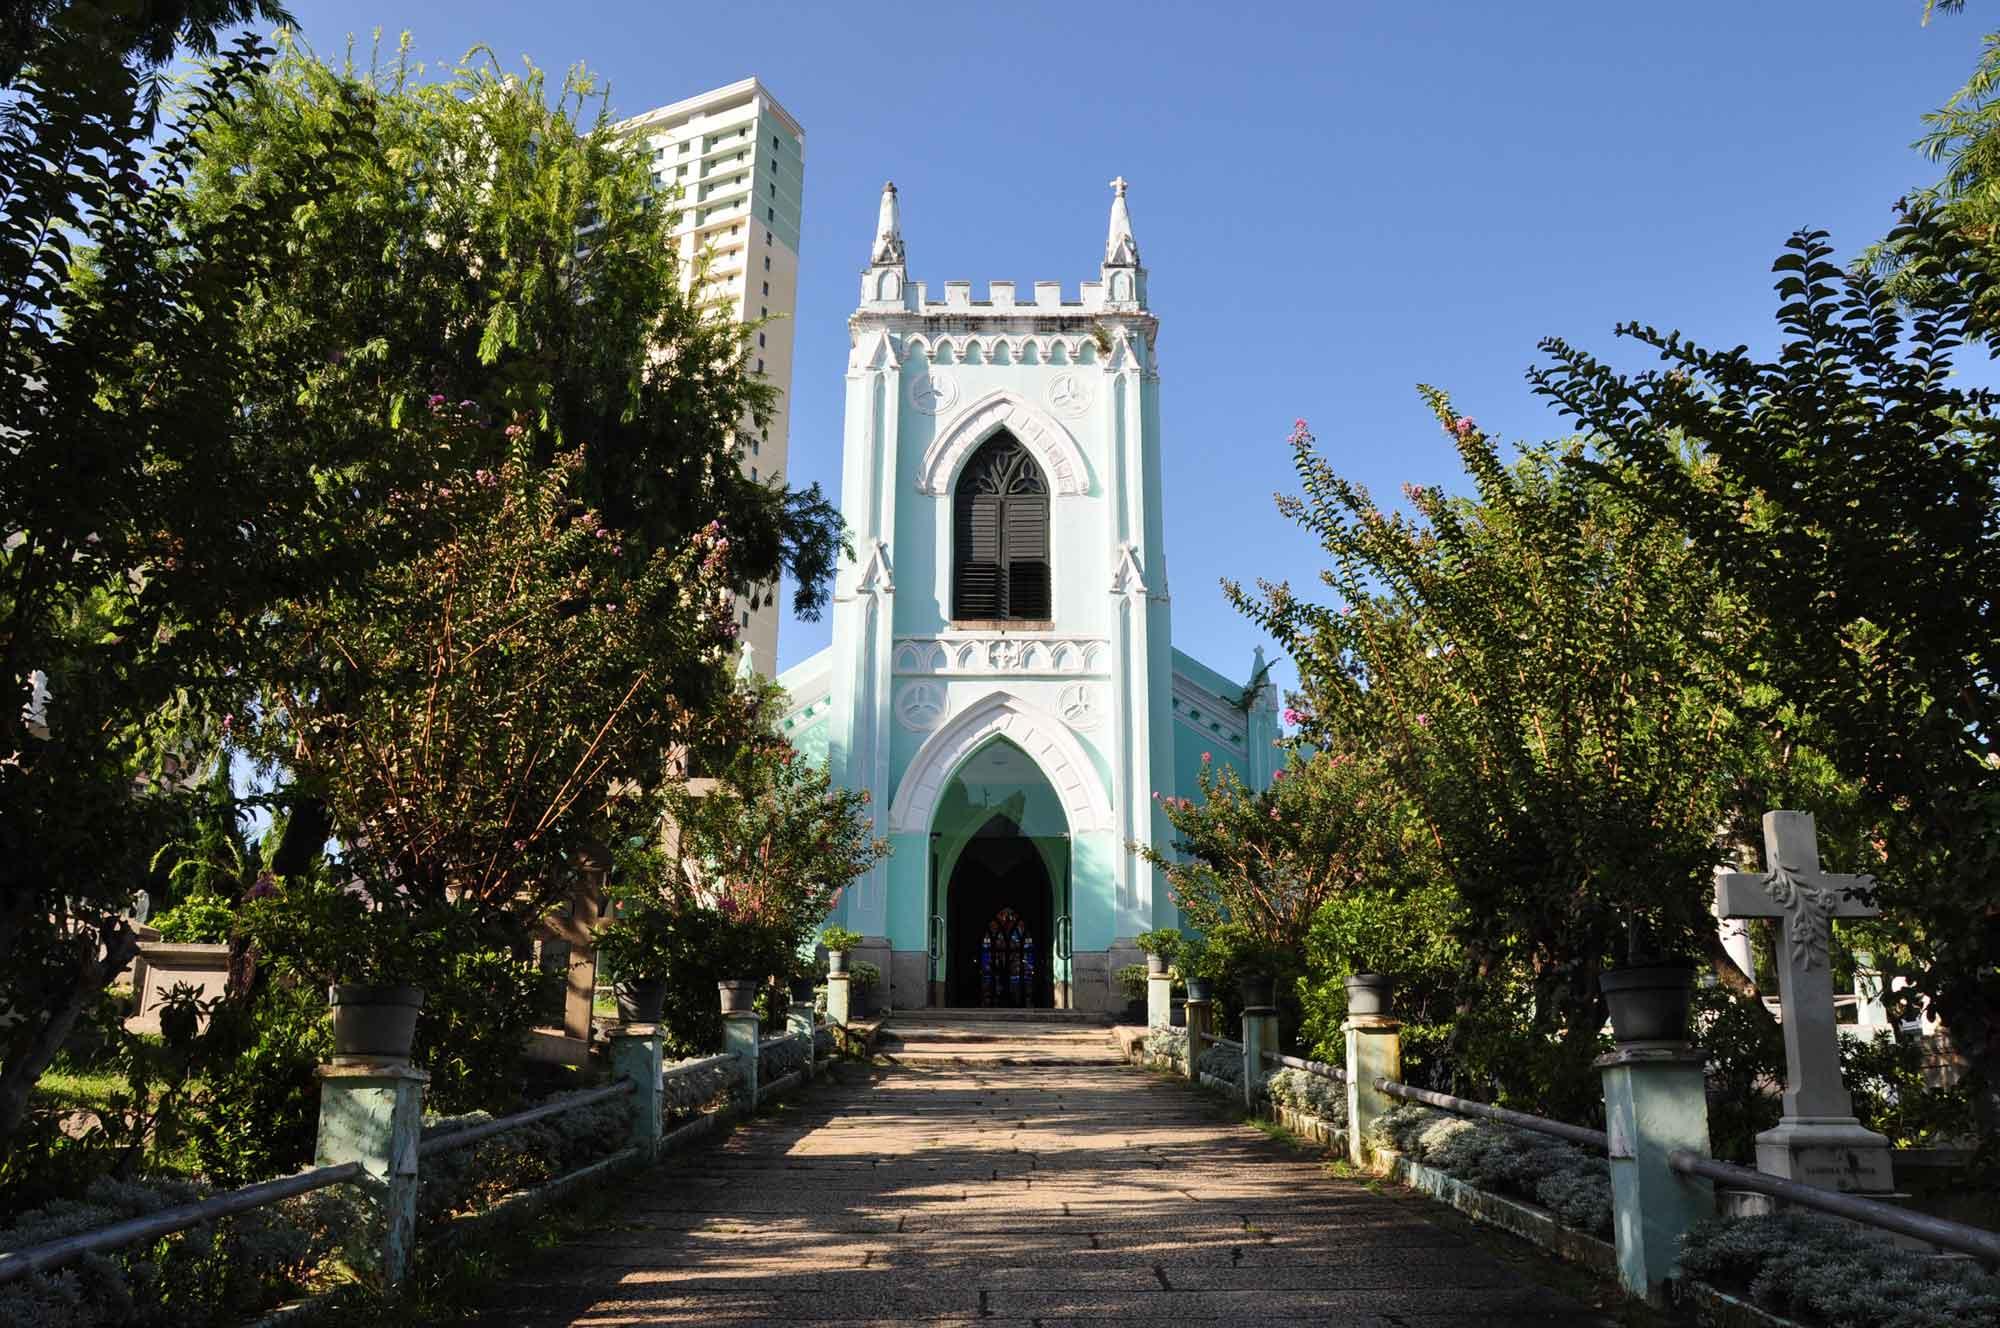 Macau Churches: Chapel of St. Michael